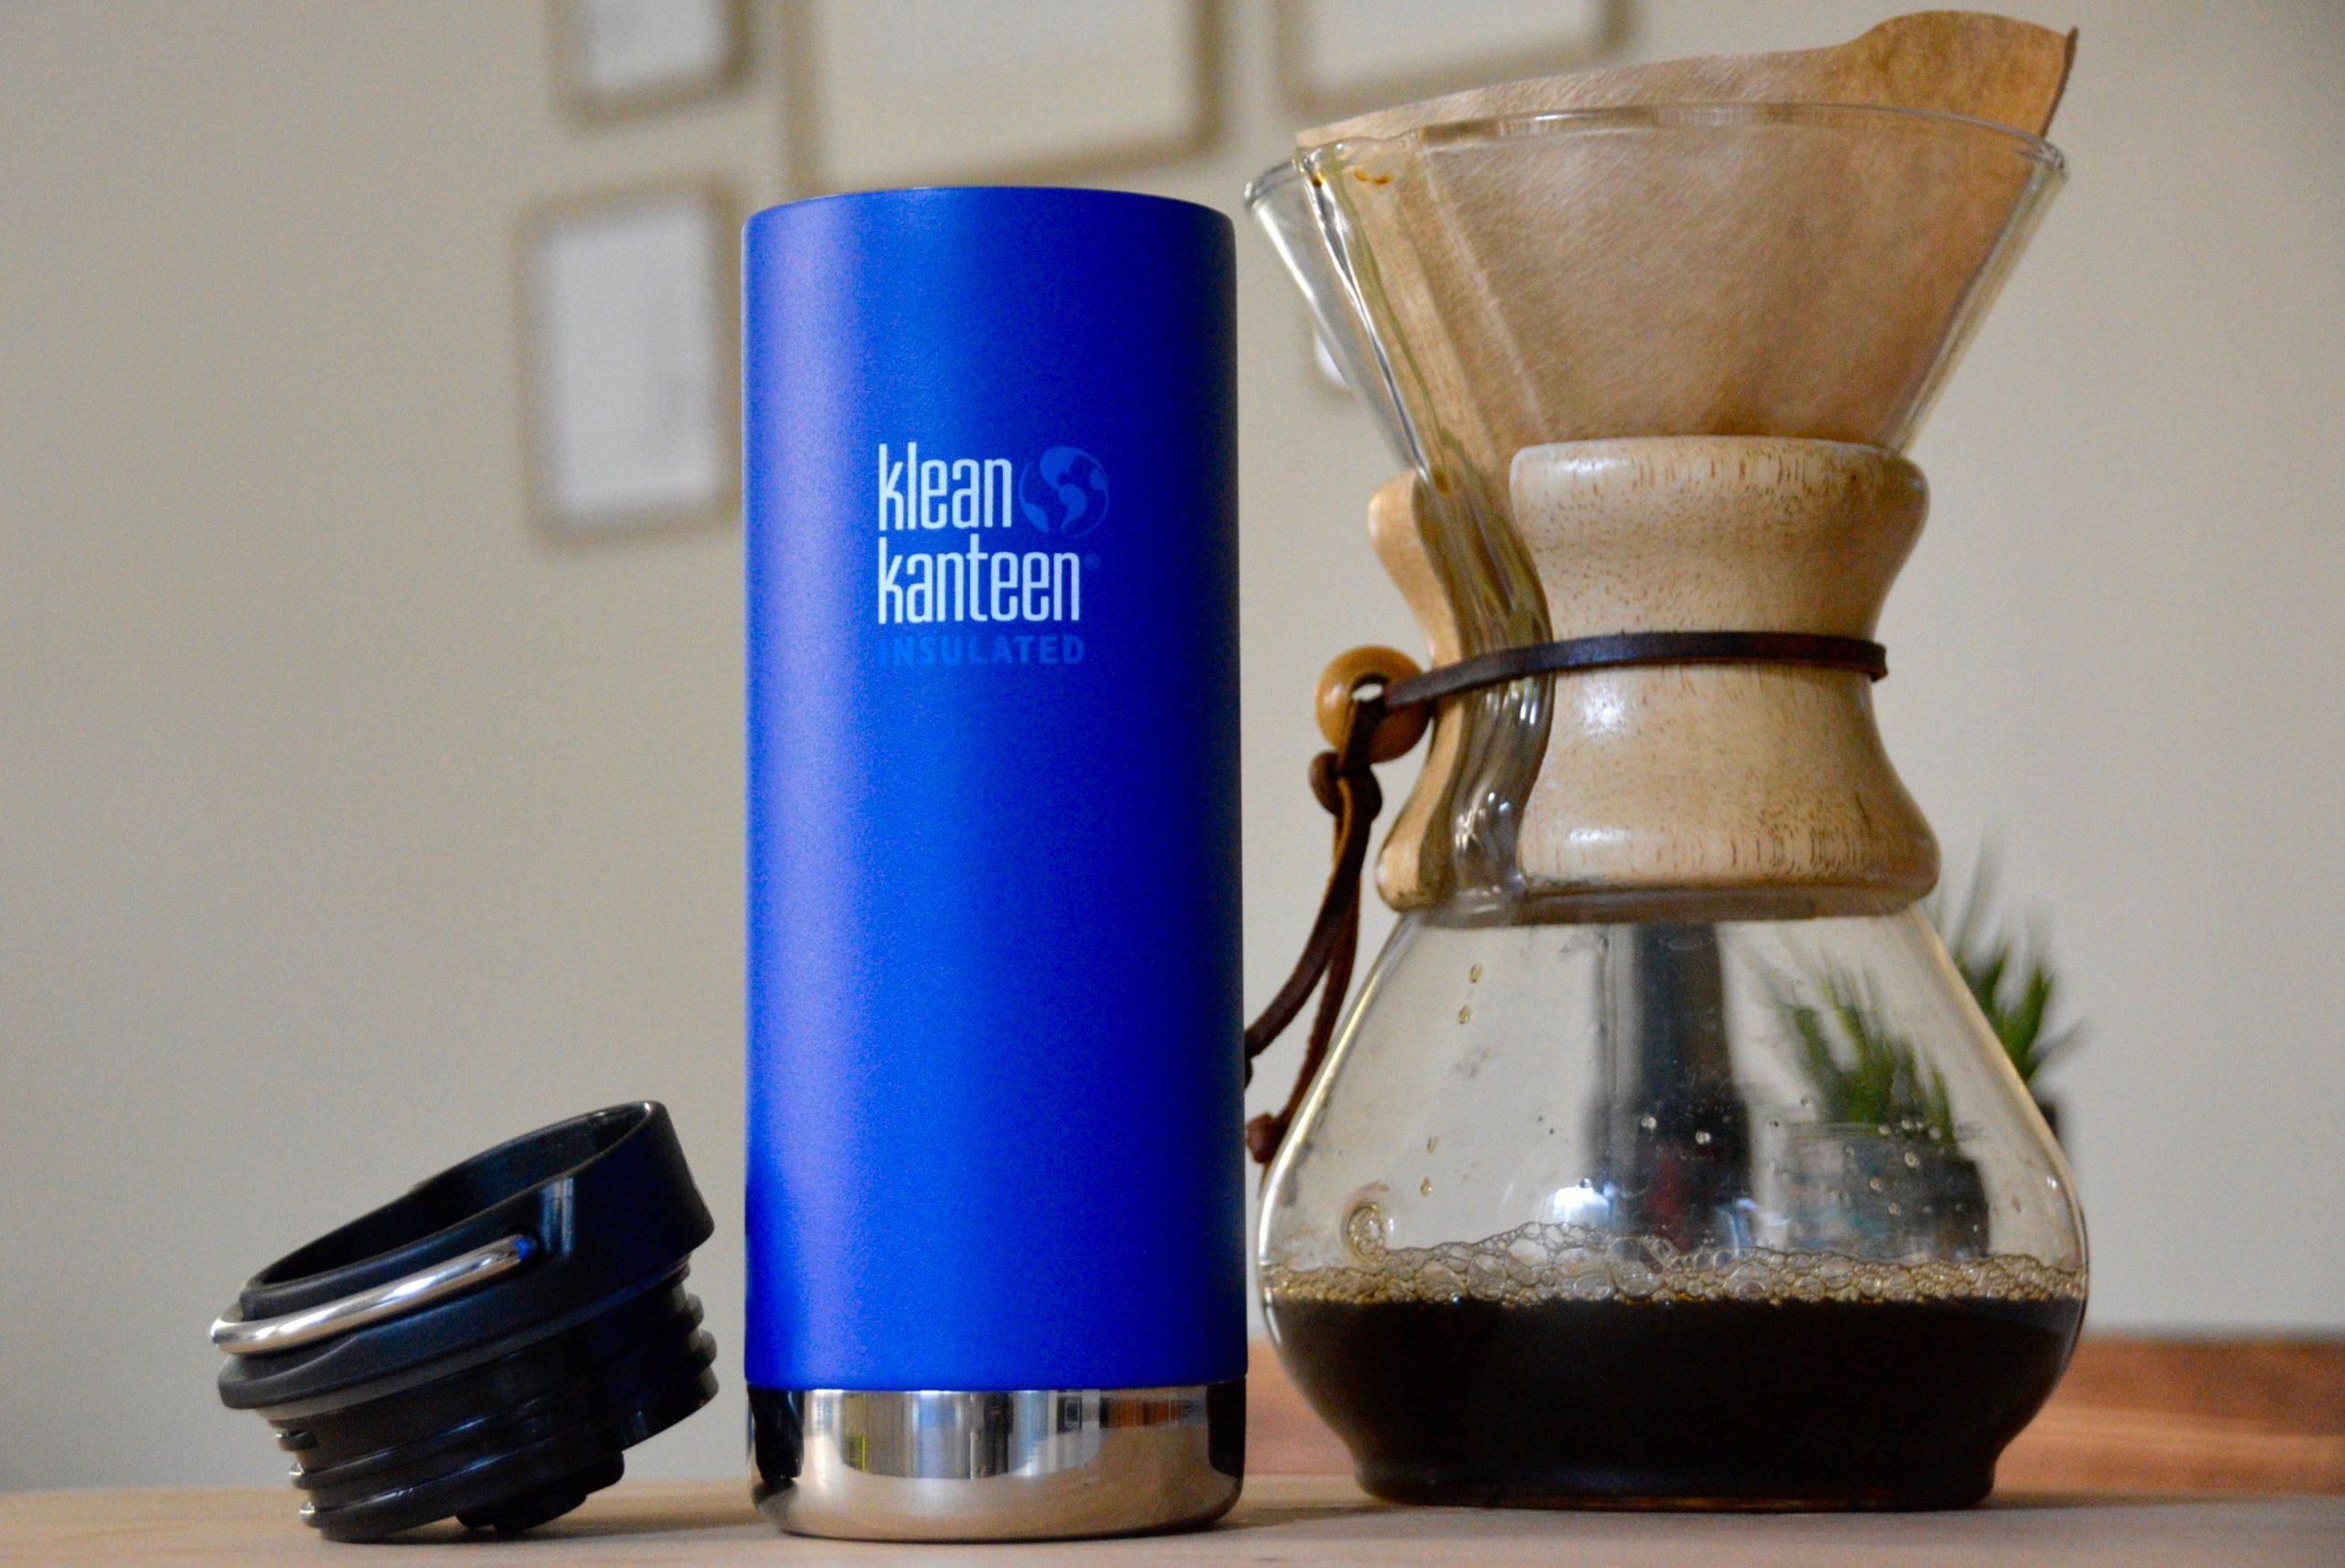 Klean Kanteen Coffee & Tea Kit